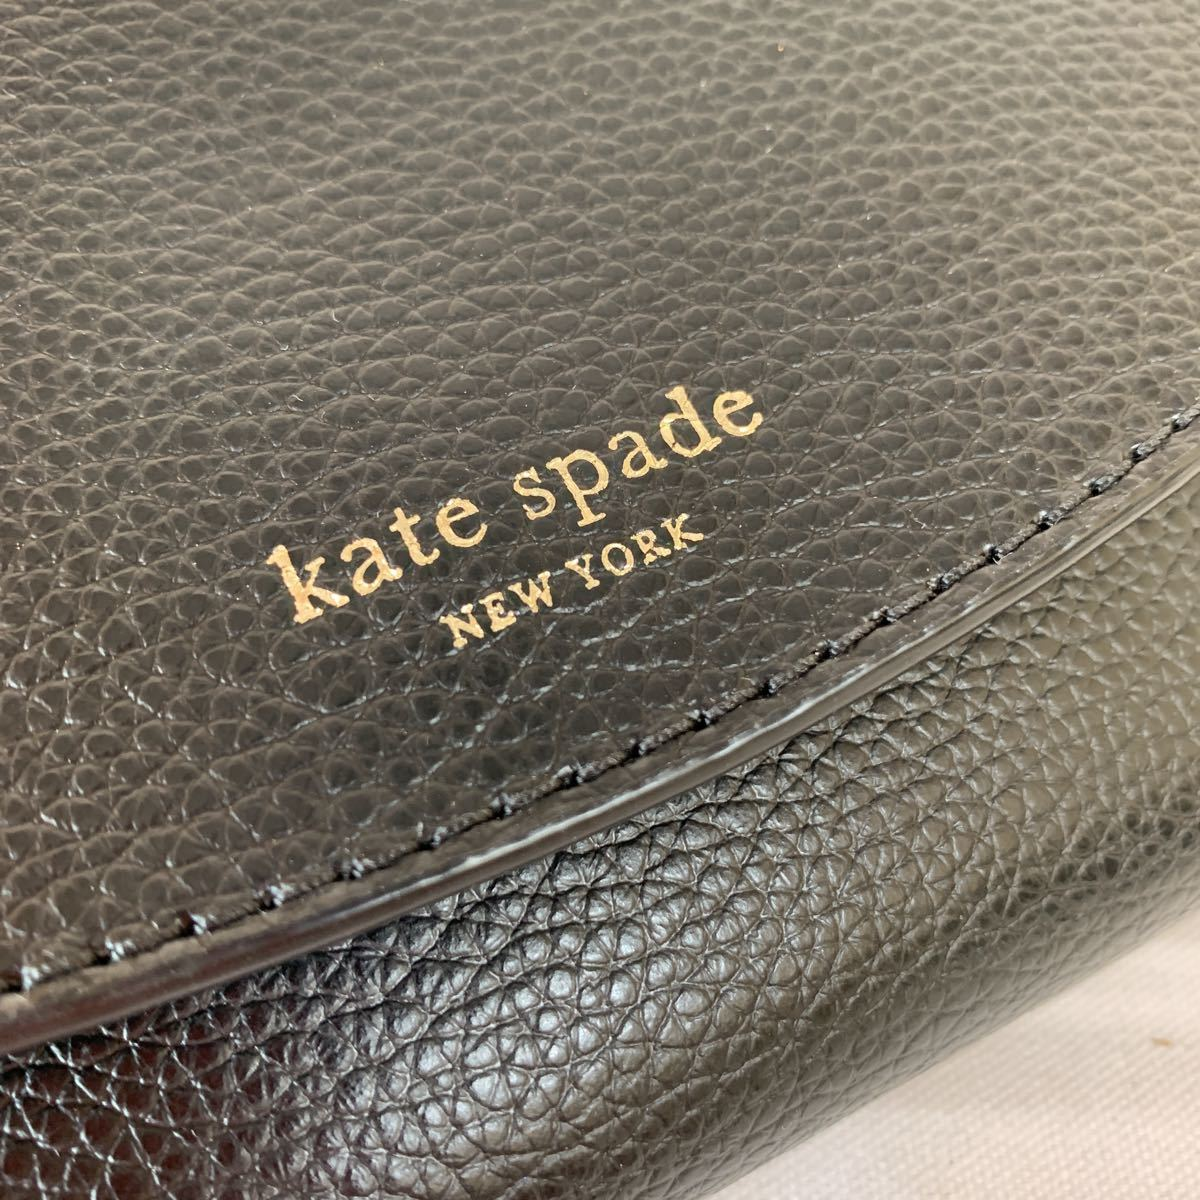 kate spade ケイトスペード ショルダー ショルダーバッグ お財布ショルダー 長財布 肩がけ カード収納 たくさん収納可能_画像4